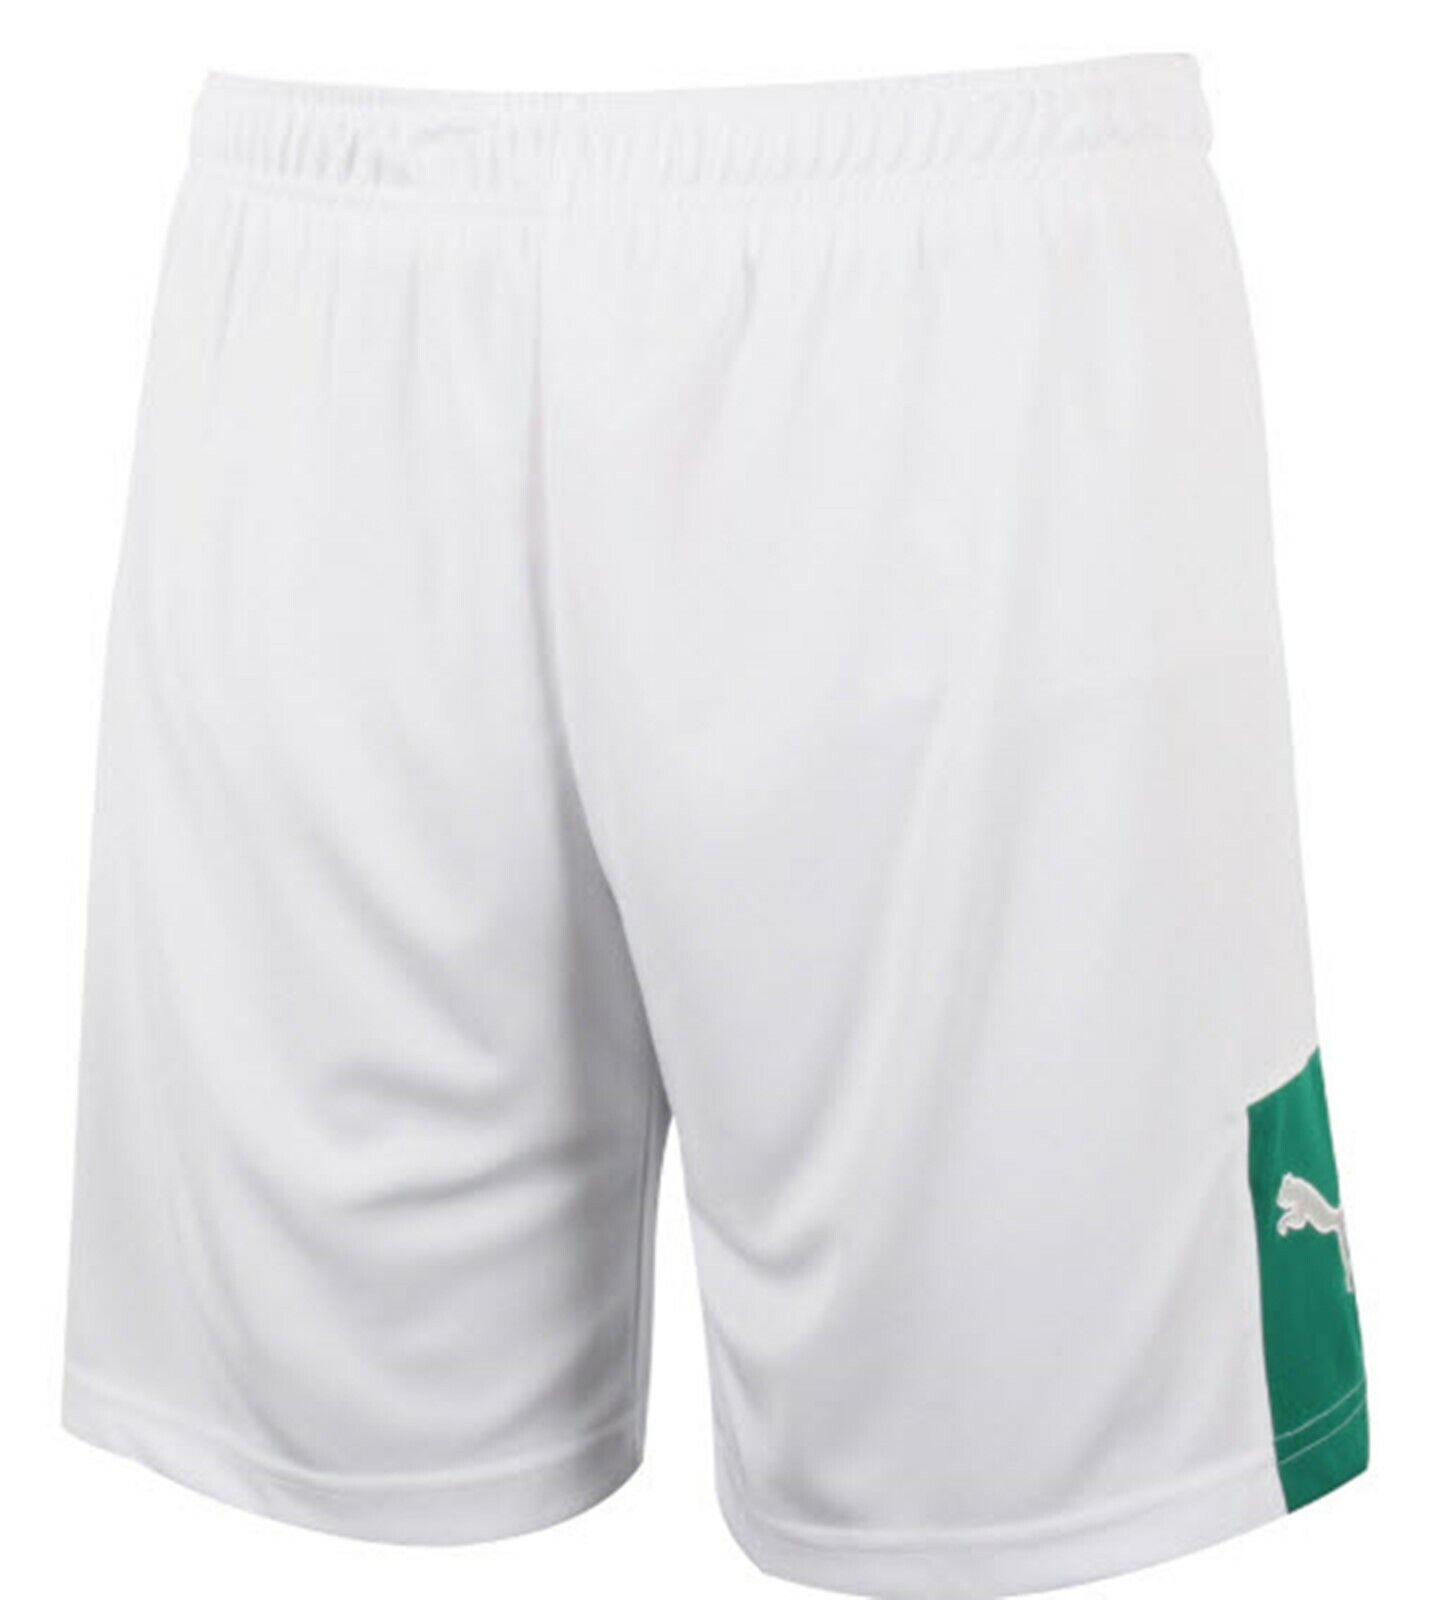 631cca3b36947 Puma Men Storm WB Shorts Pants Training White Running Uniform GYM Pant  89604202